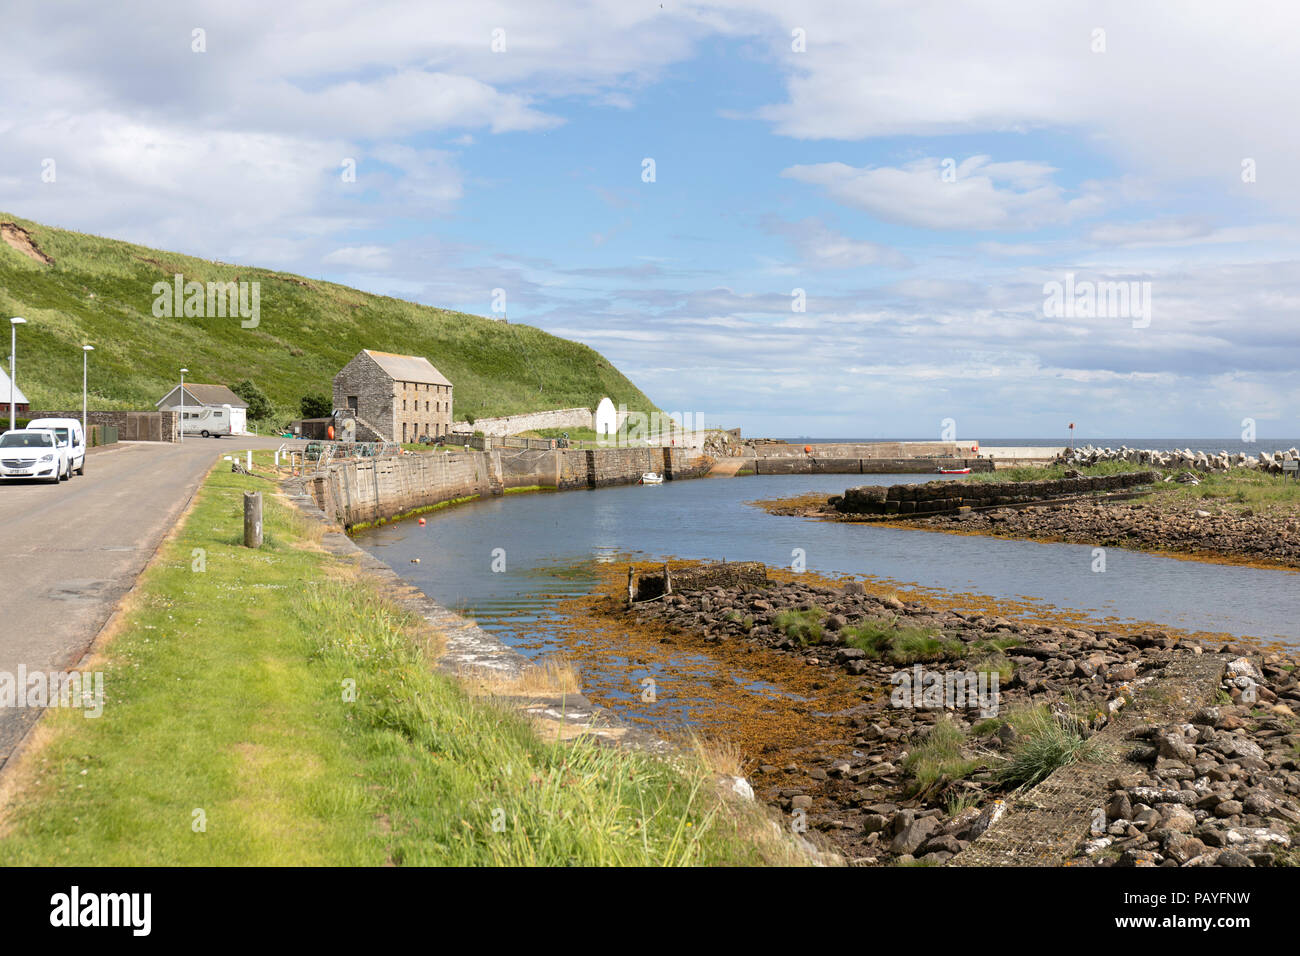 Dunbeath Harbour, the Highlands, Scotland - Stock Image